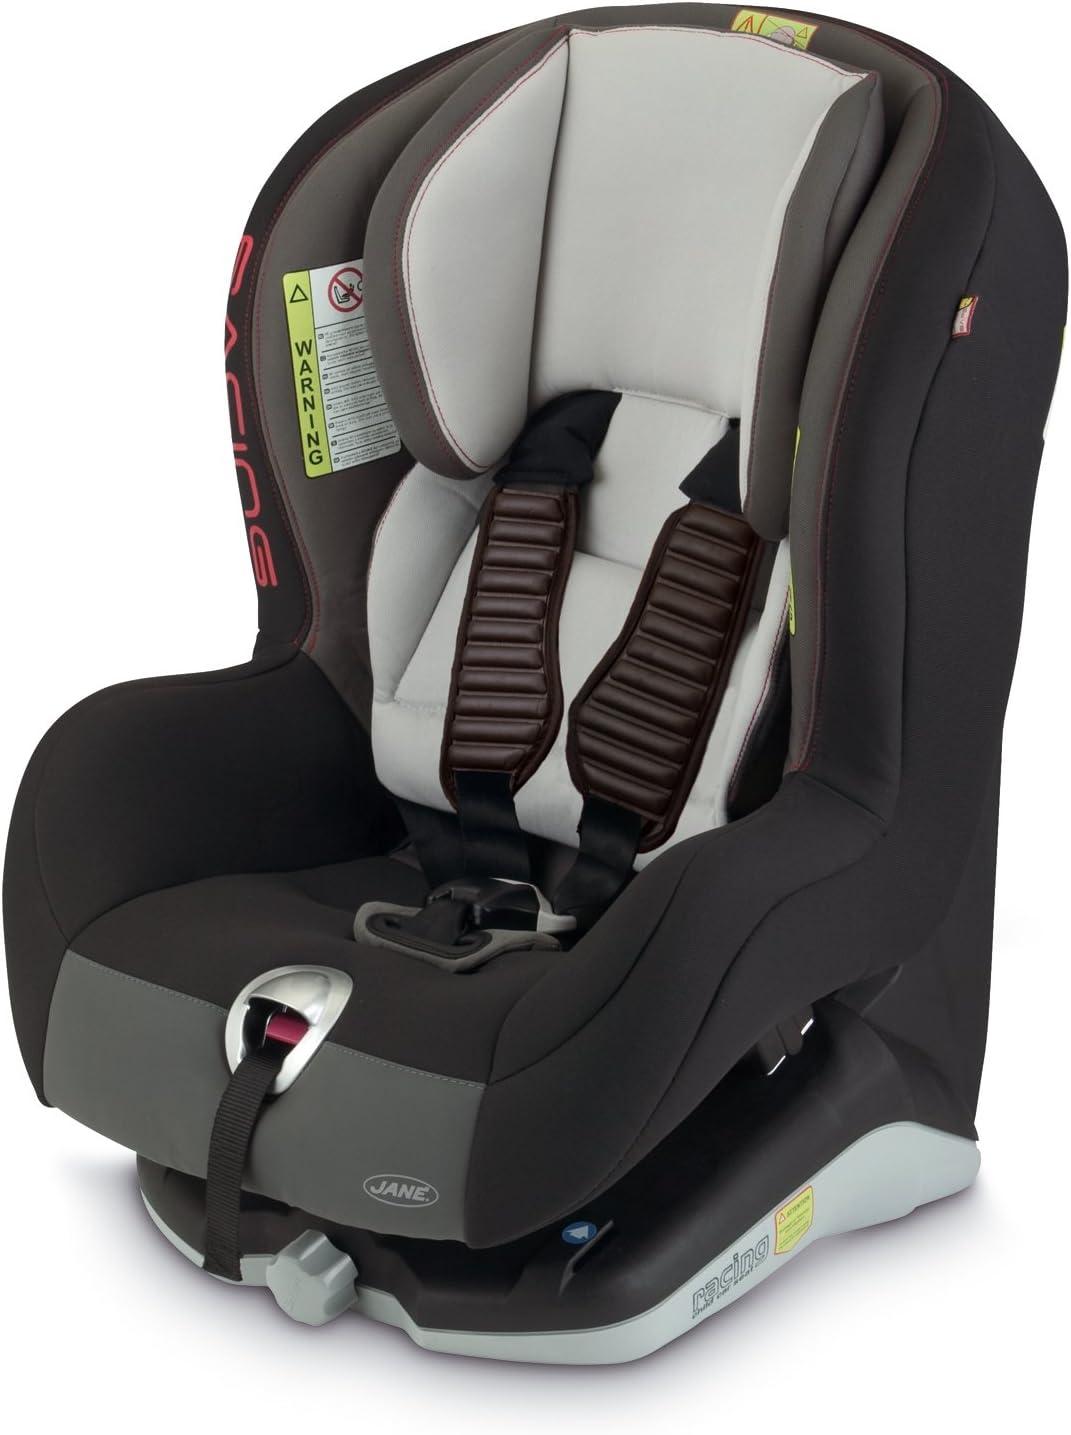 Jane Racing Group 0, 1 Car Seat (Fosco): Amazon.es: Bebé